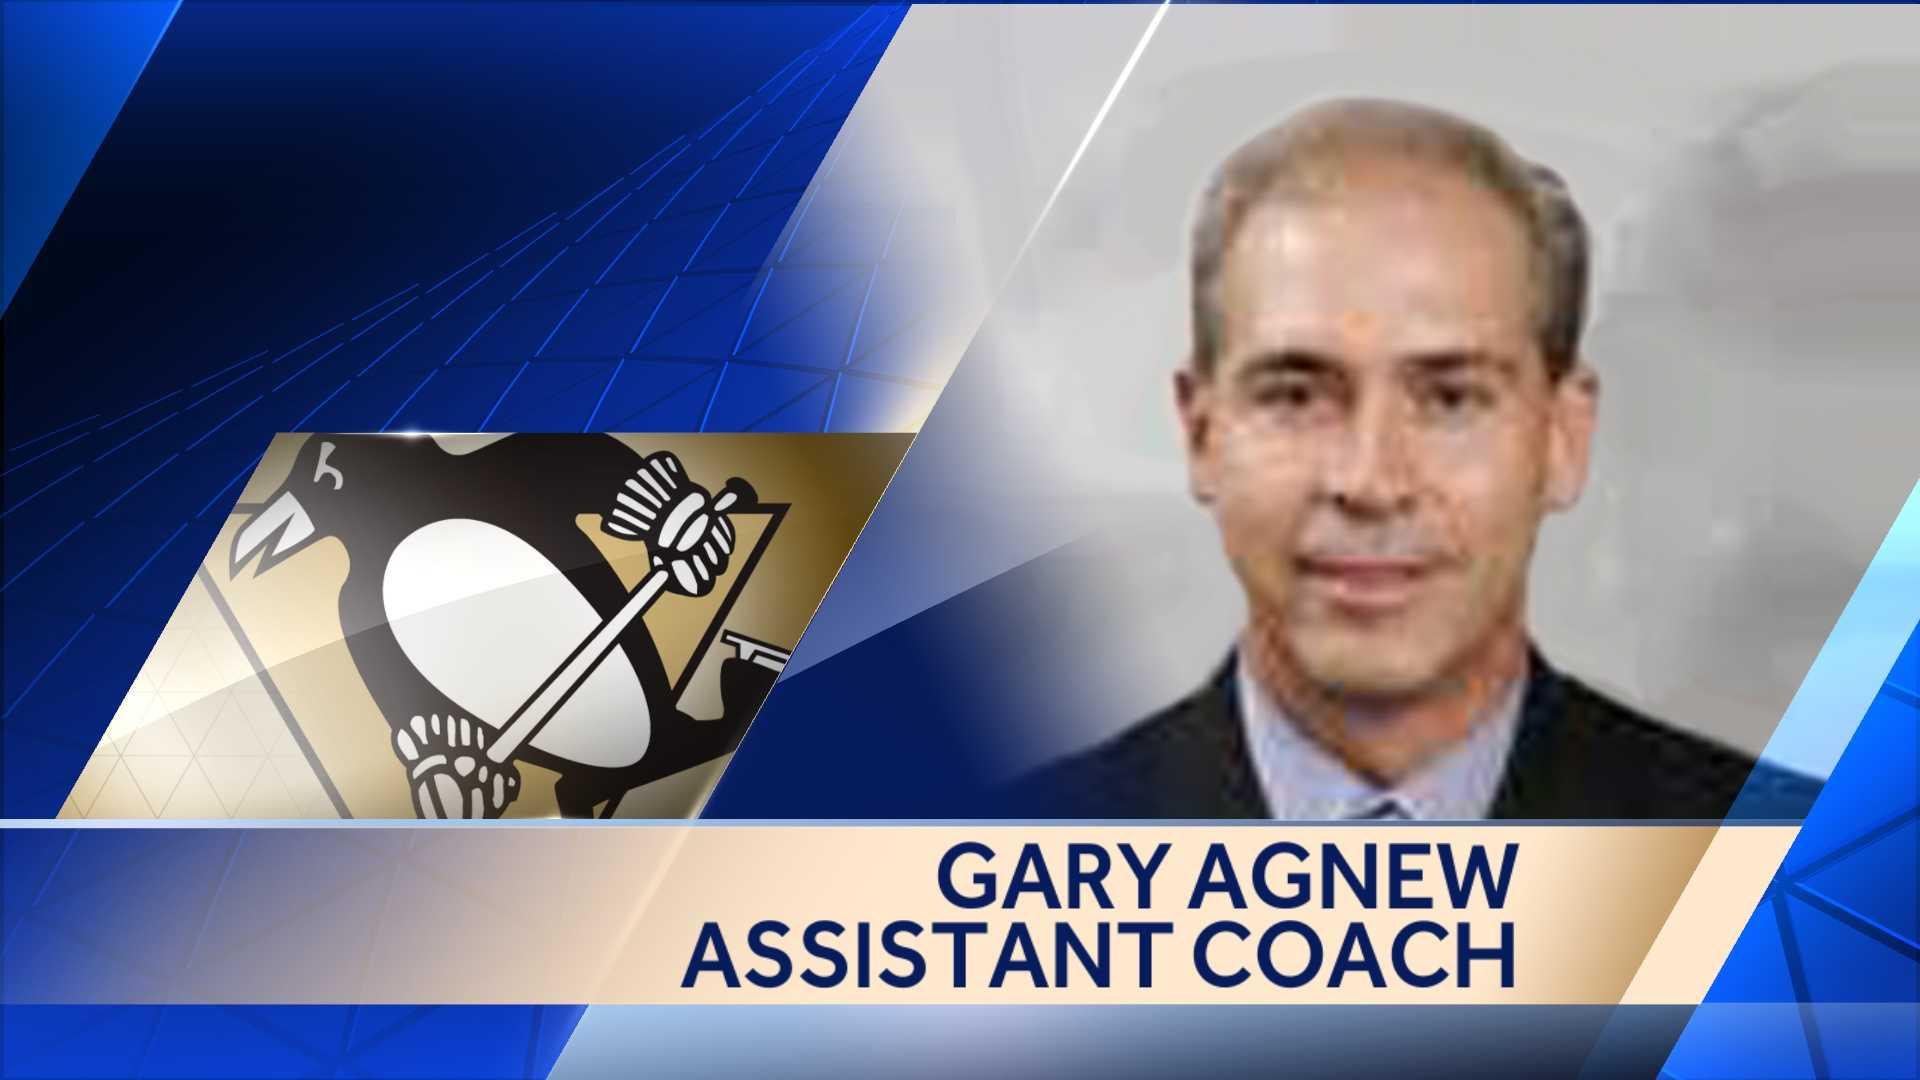 Gary Agnew